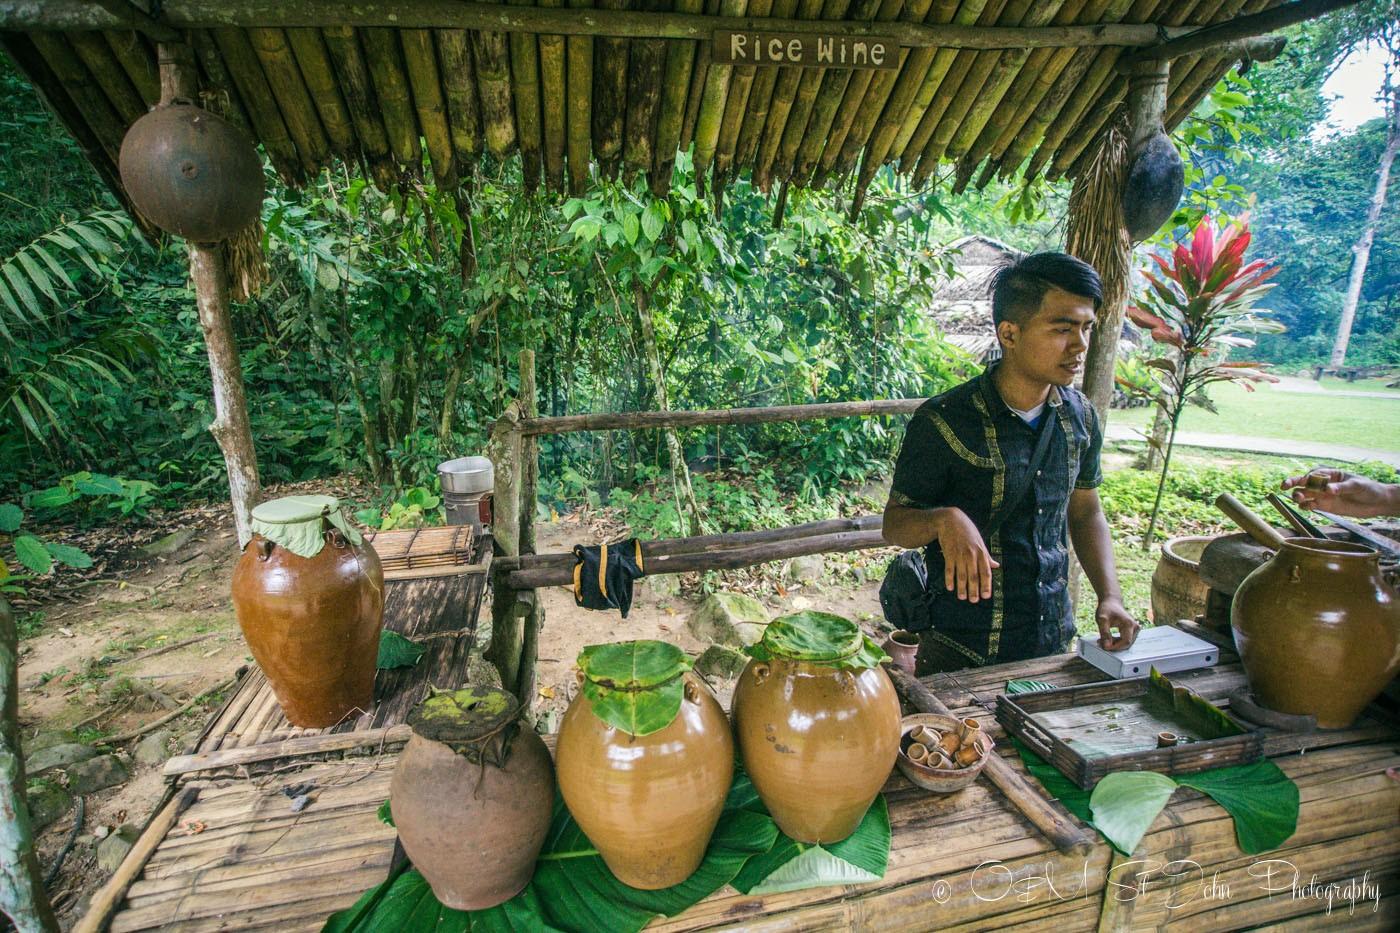 tourist attraction in malaysia essay